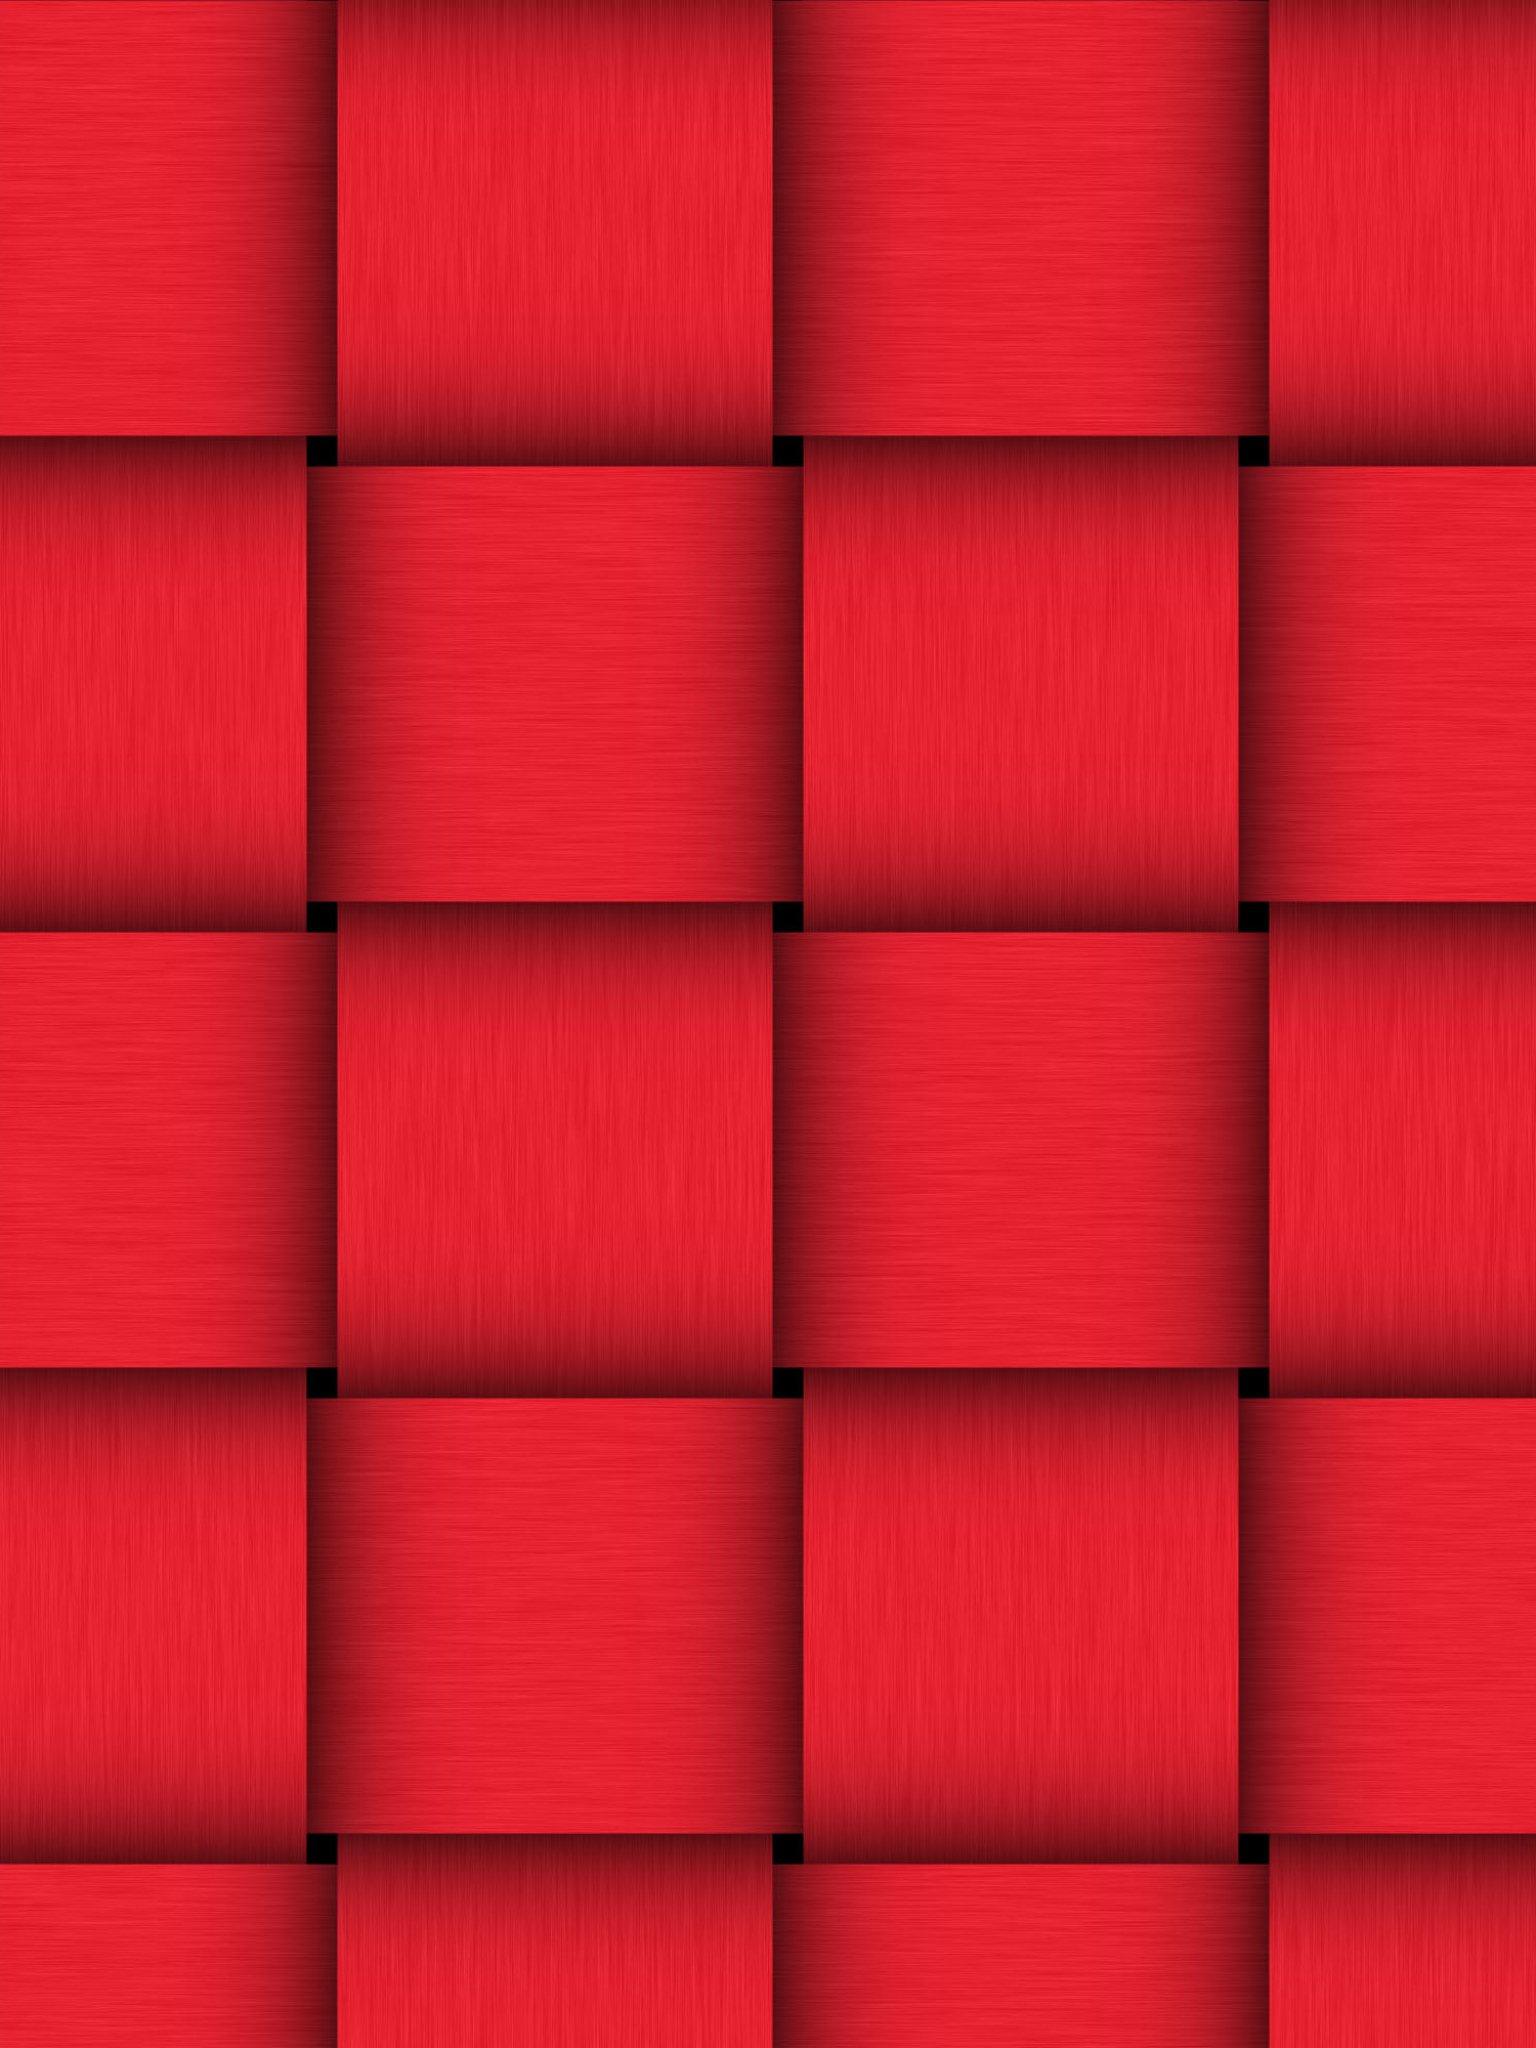 Wallpaper 901006